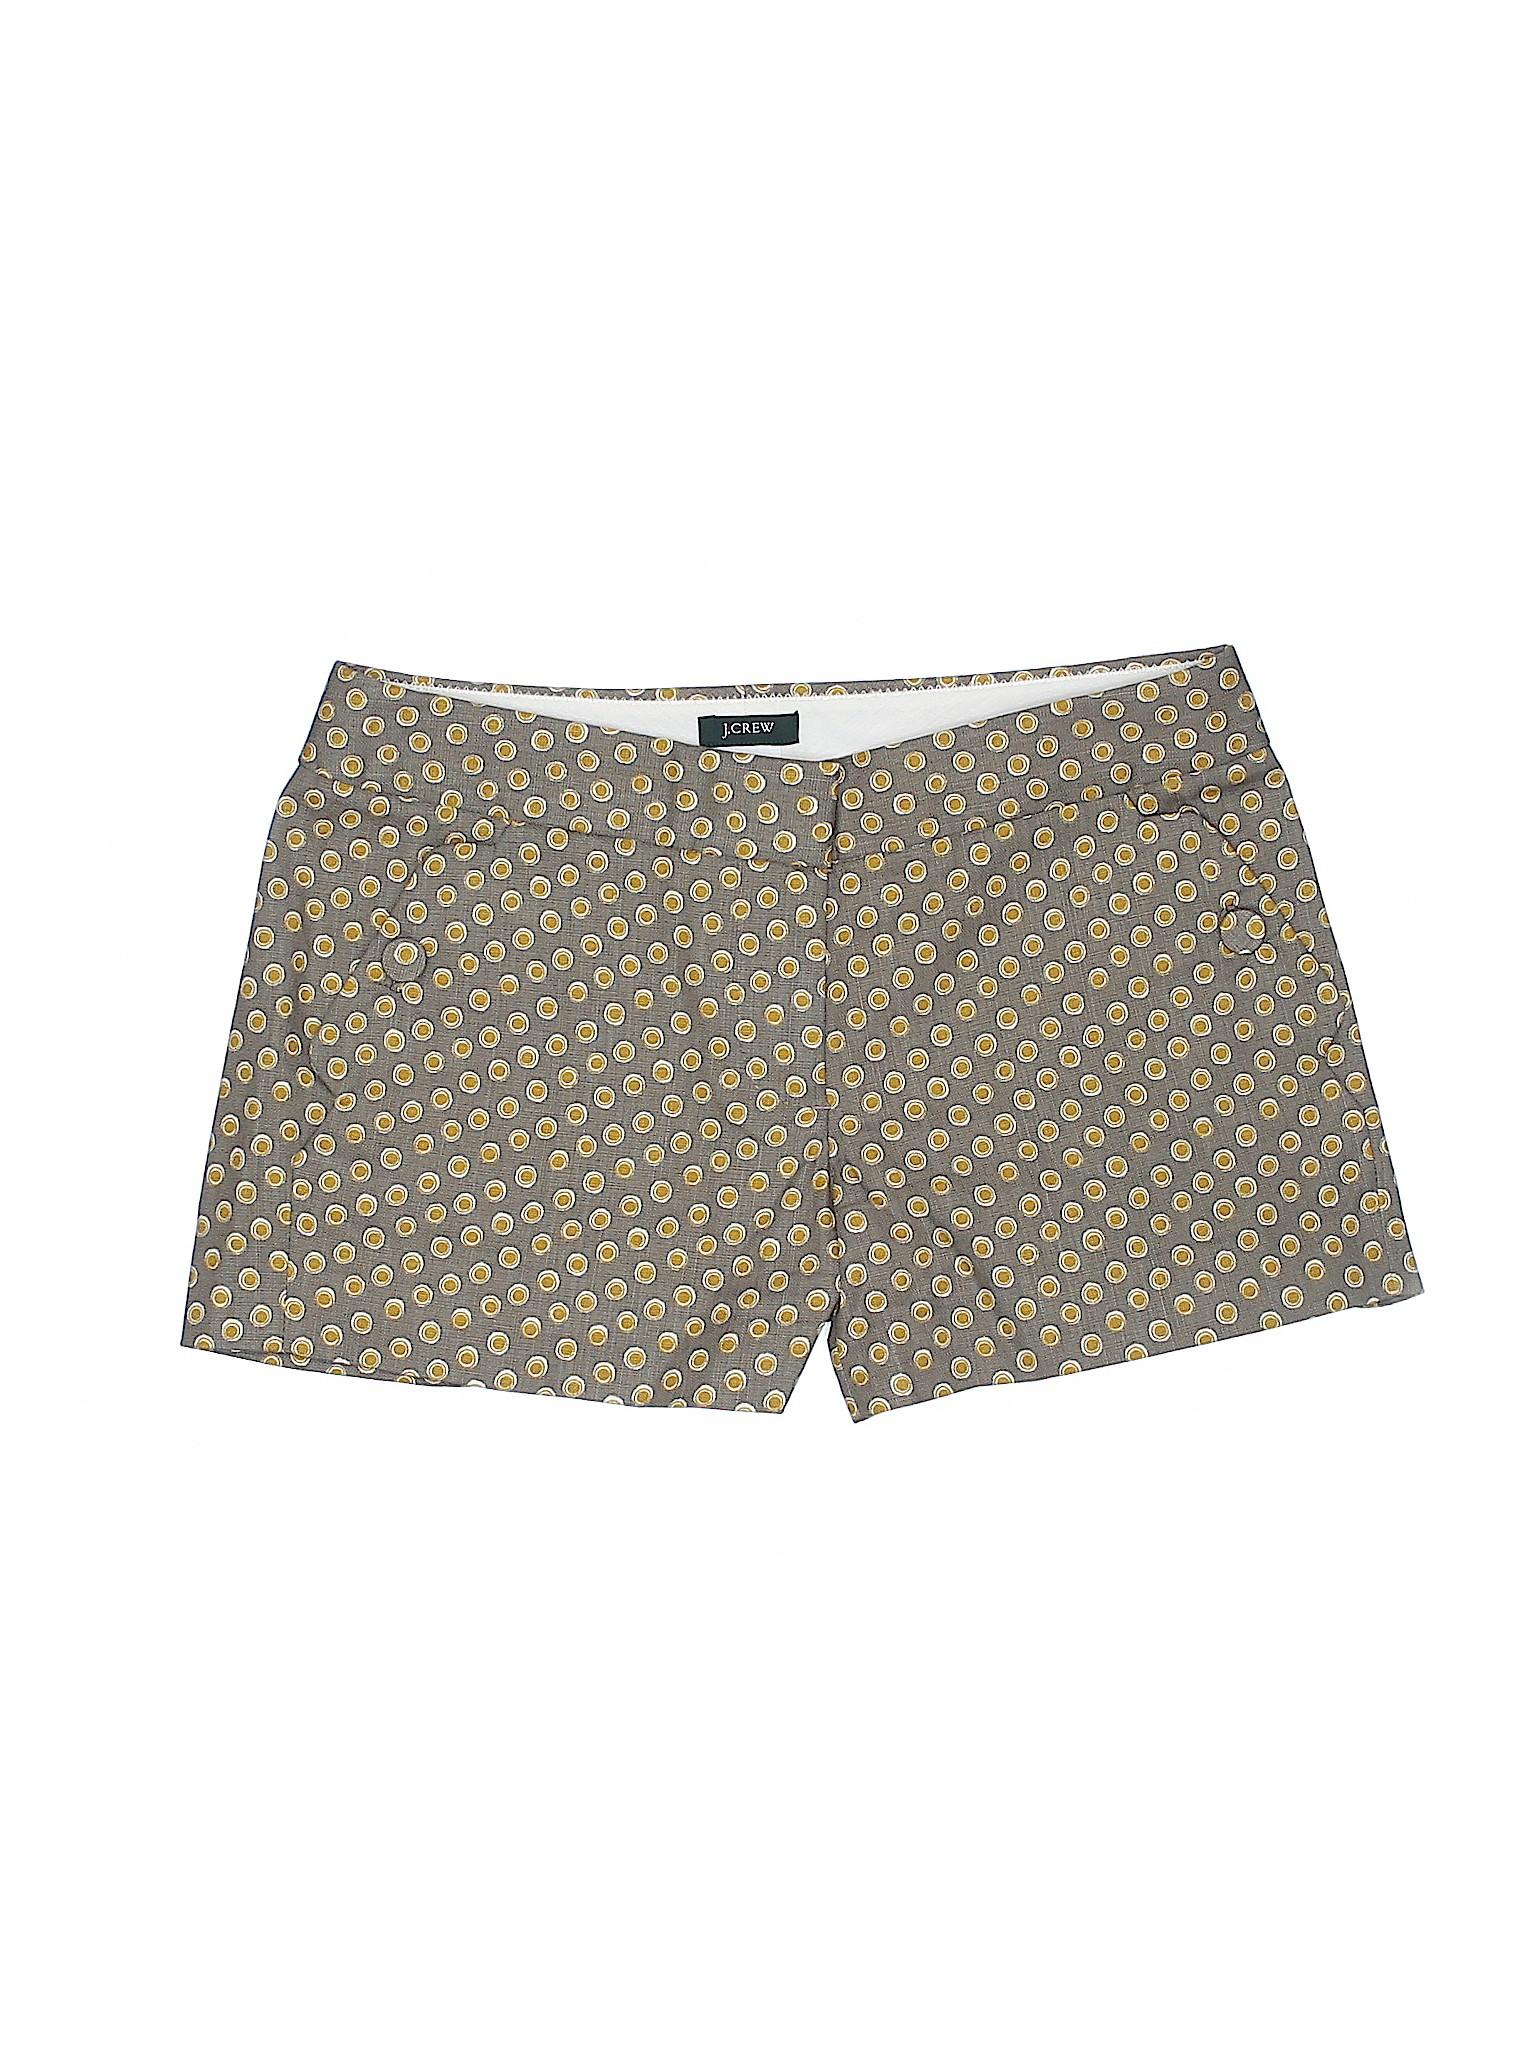 Khaki Shorts Boutique Boutique J Khaki Crew Crew J SCq8wxd0S